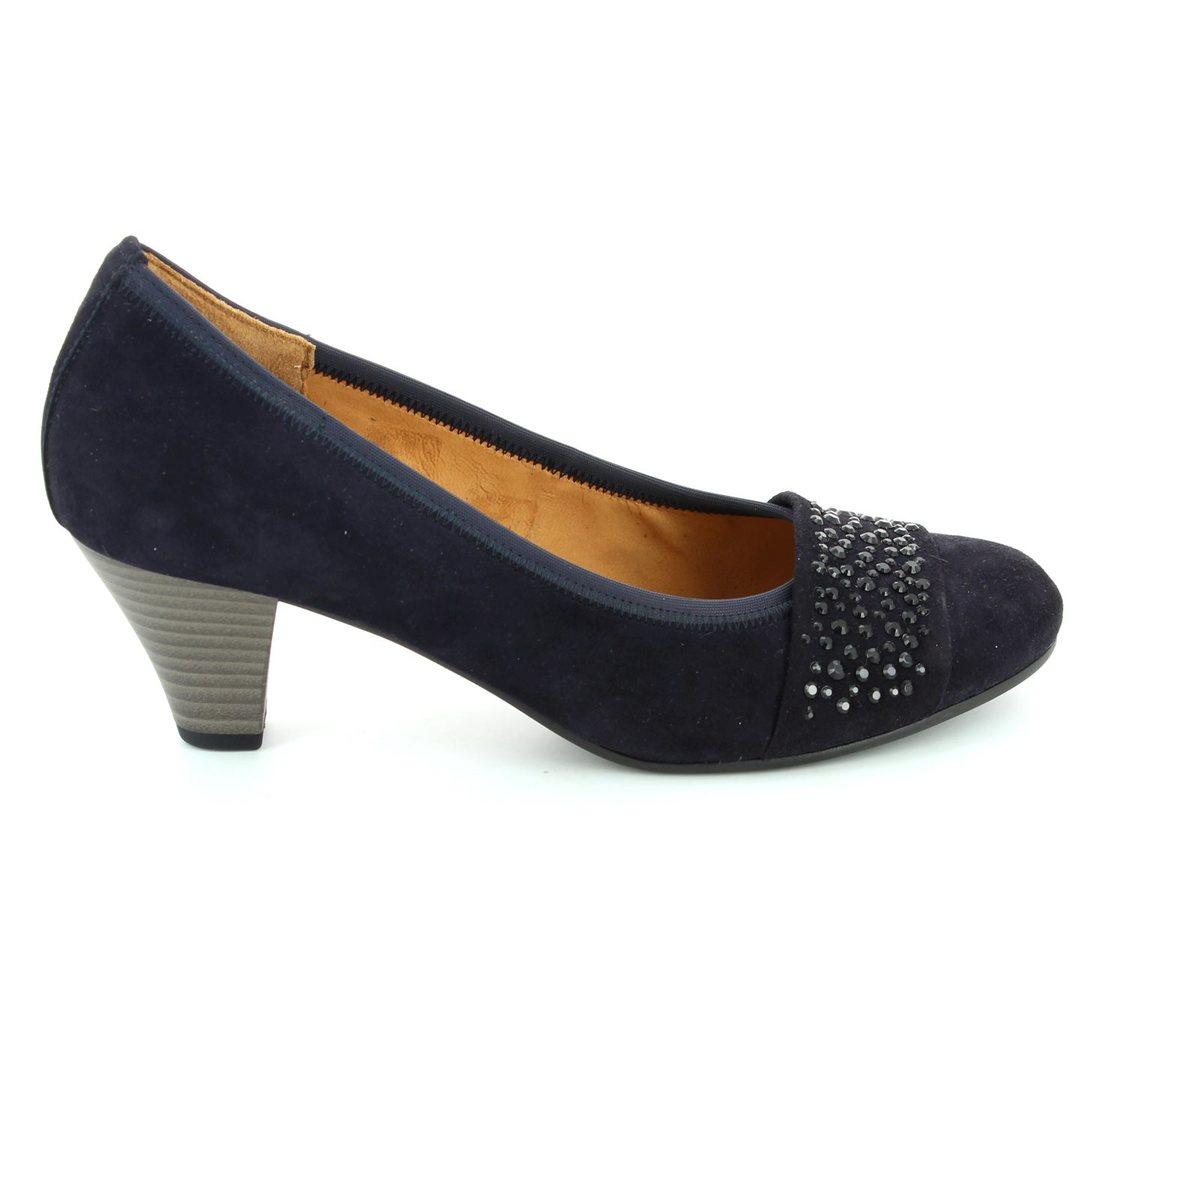 3e7b1ef9268b Gabor Heeled Shoes - Navy nubuck - 55.482.16 WALLACE